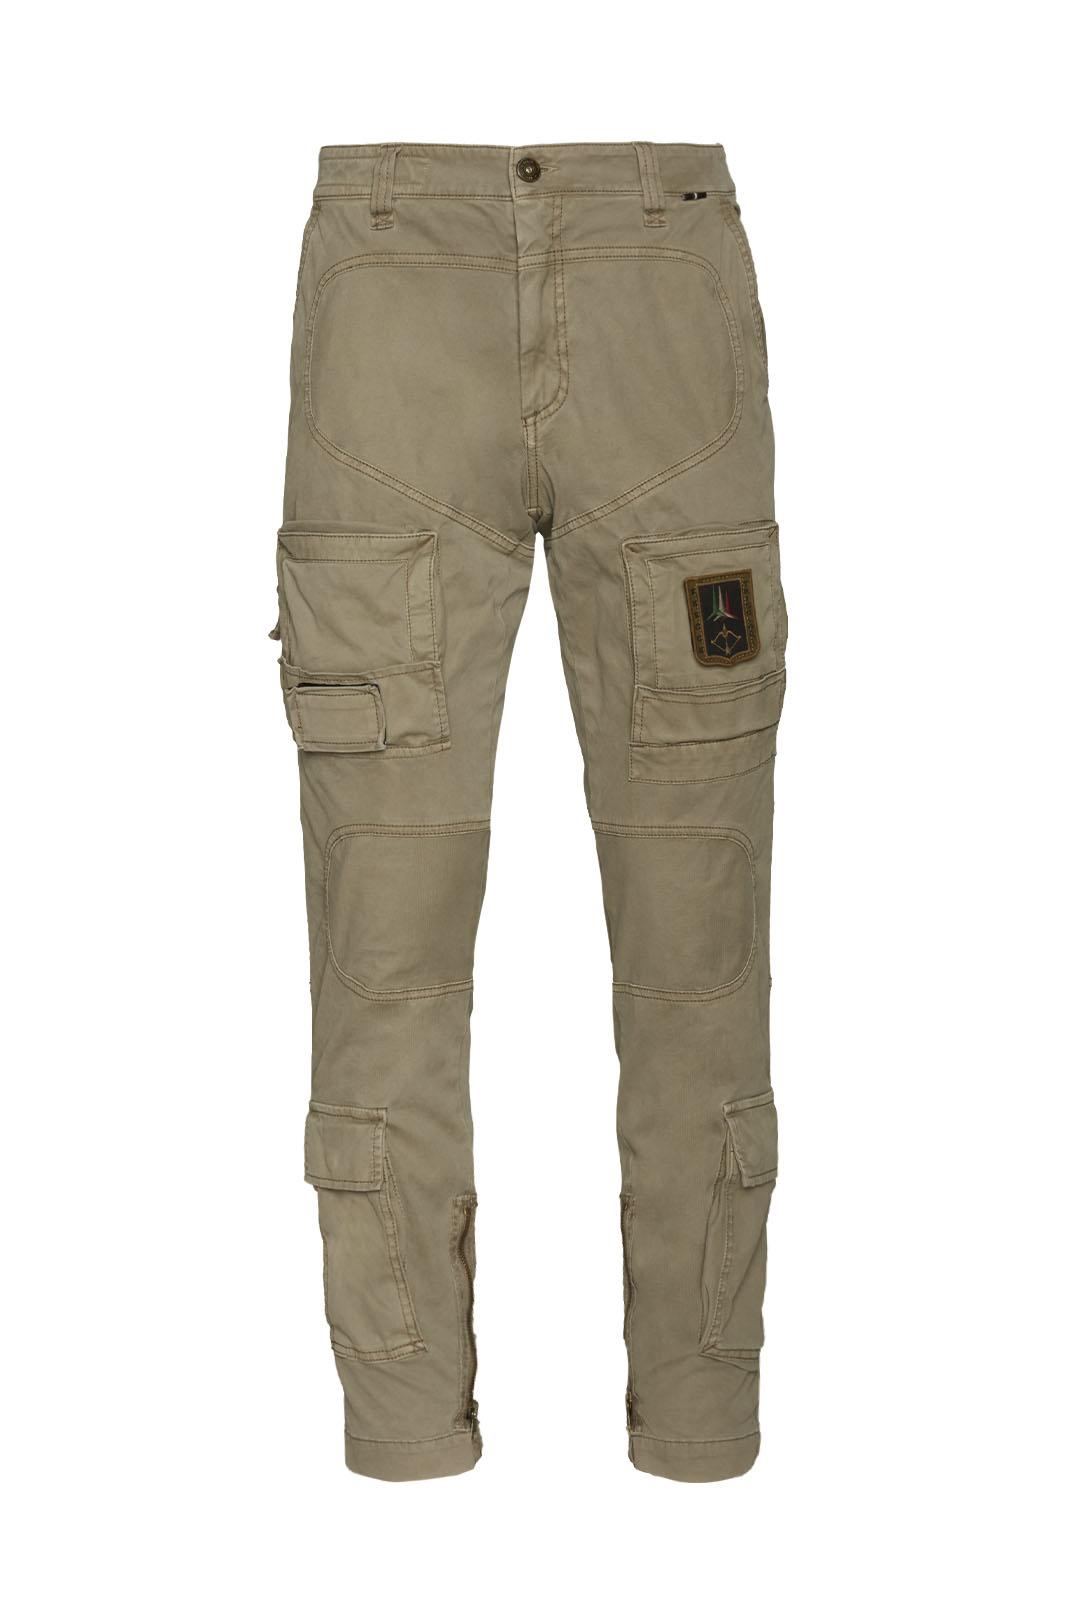 Iconic gabardine Anti-G trousers         1